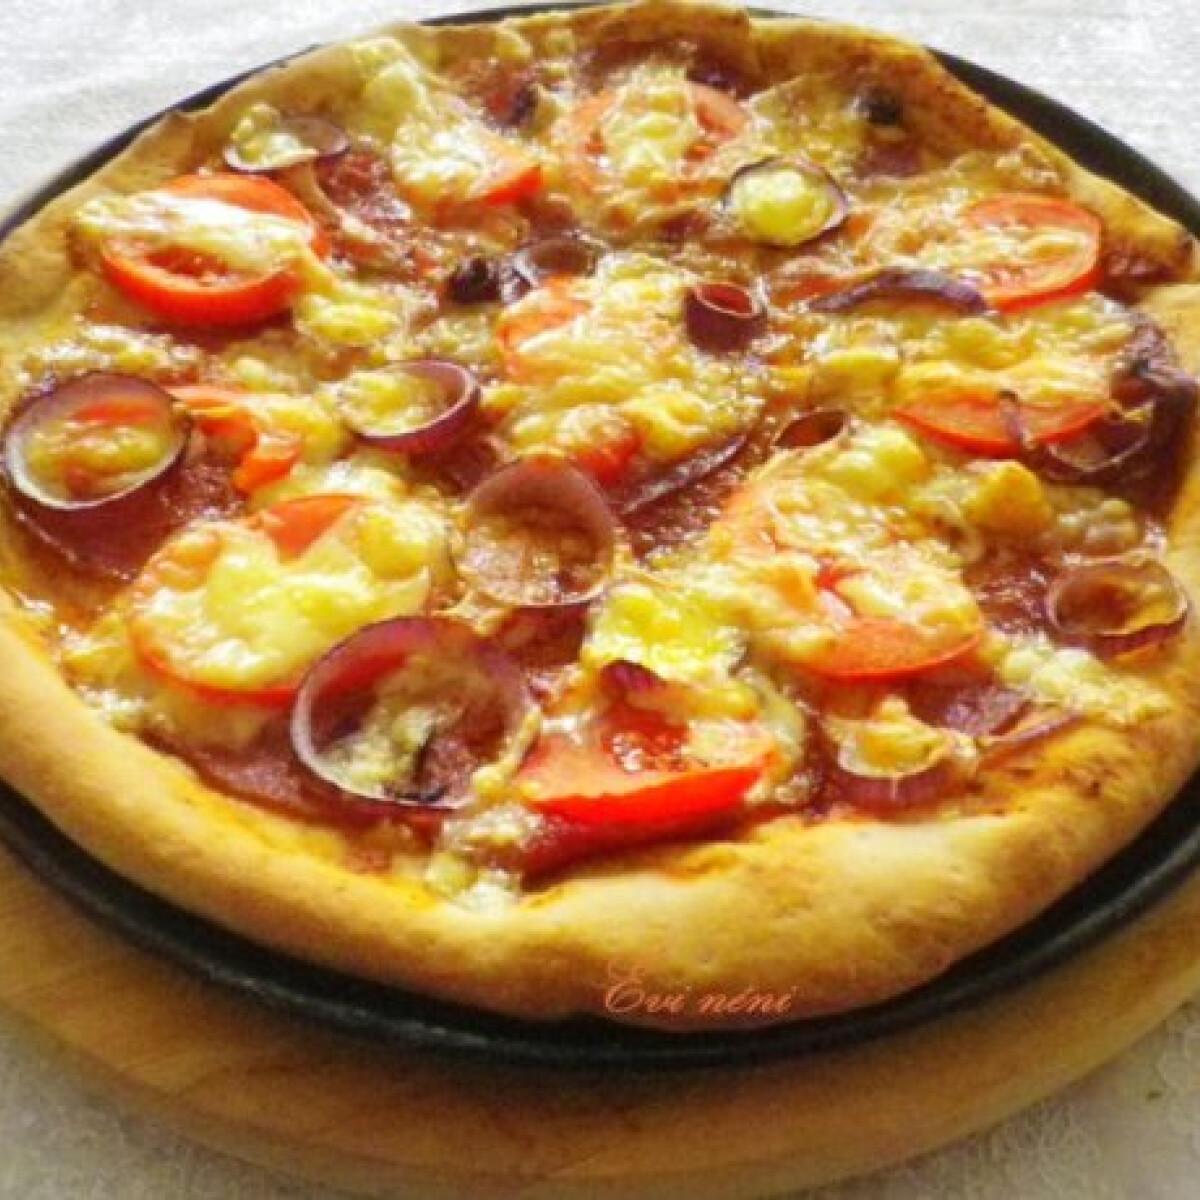 Ezen a képen: Rozsos pizza